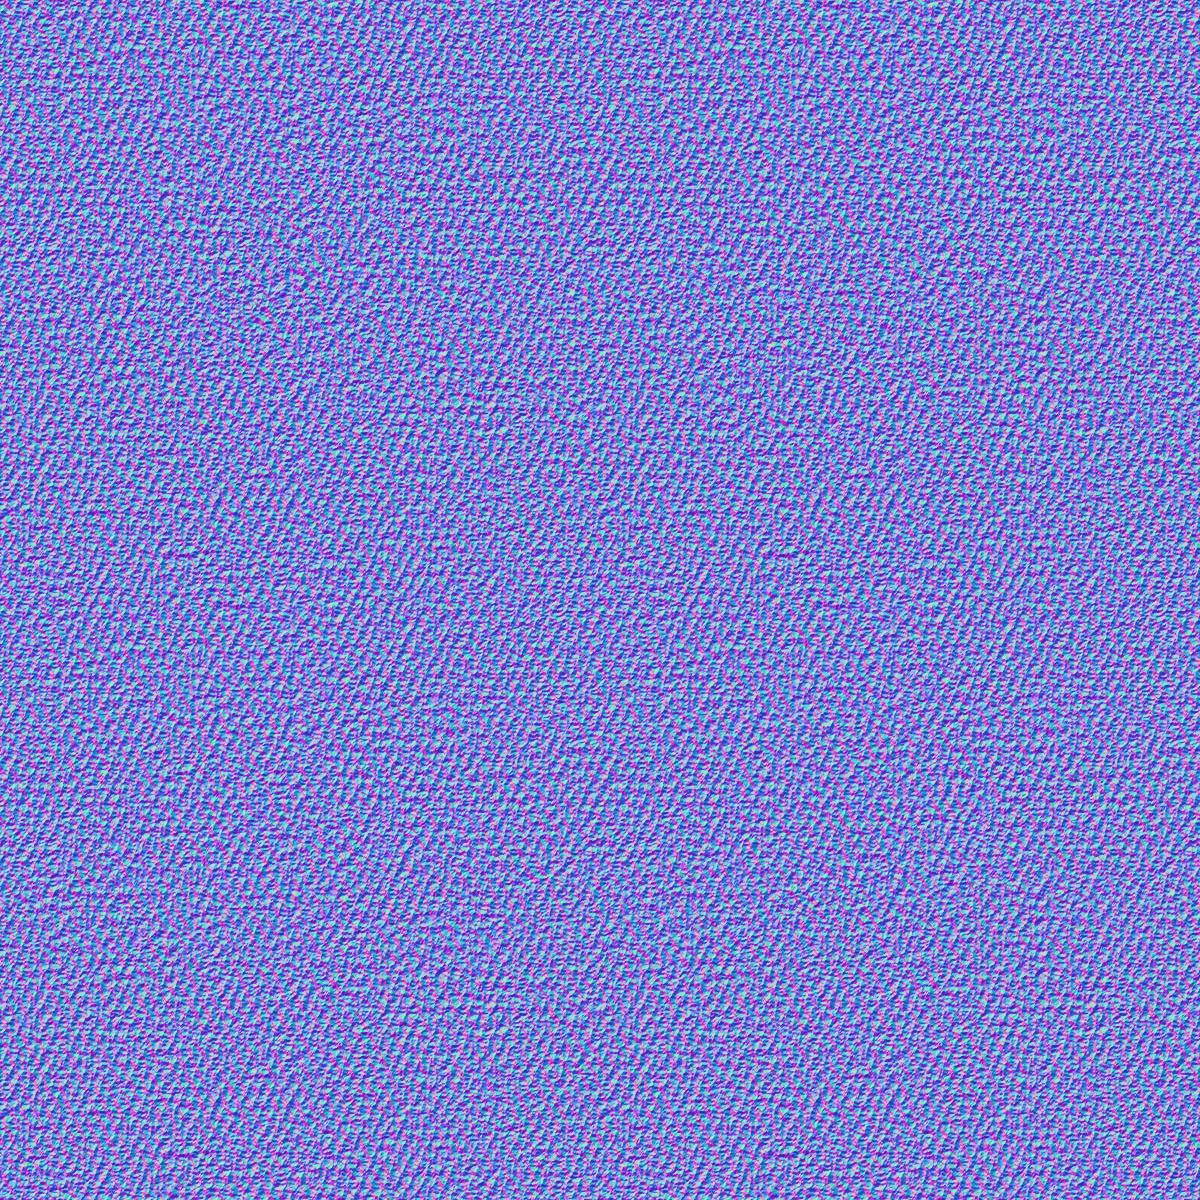 Carpet Texture (Maps) | Texturise Free Seamless Textures With Maps